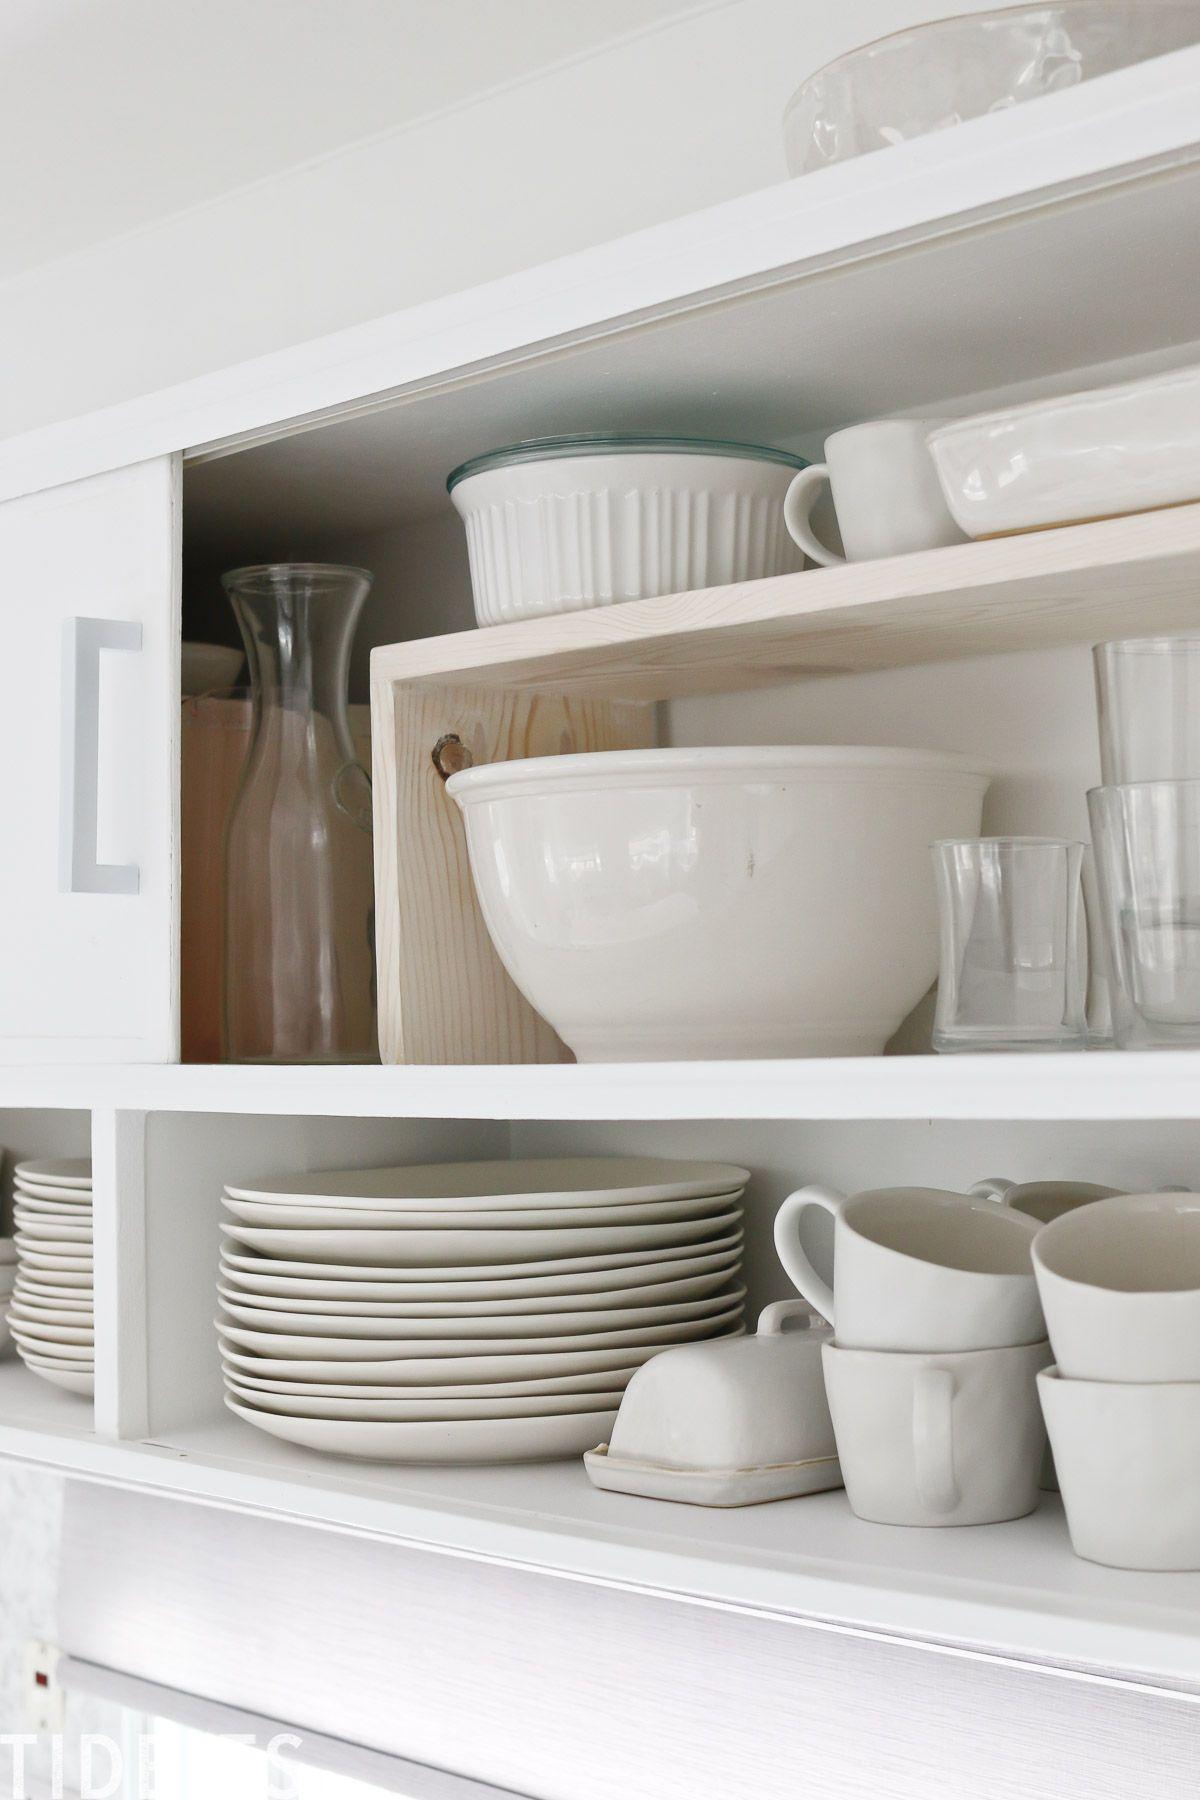 Easy Diy Cabinet Shelf Risers Tidbits Diy Cabinets Easy Diy Custom Size Cabinets